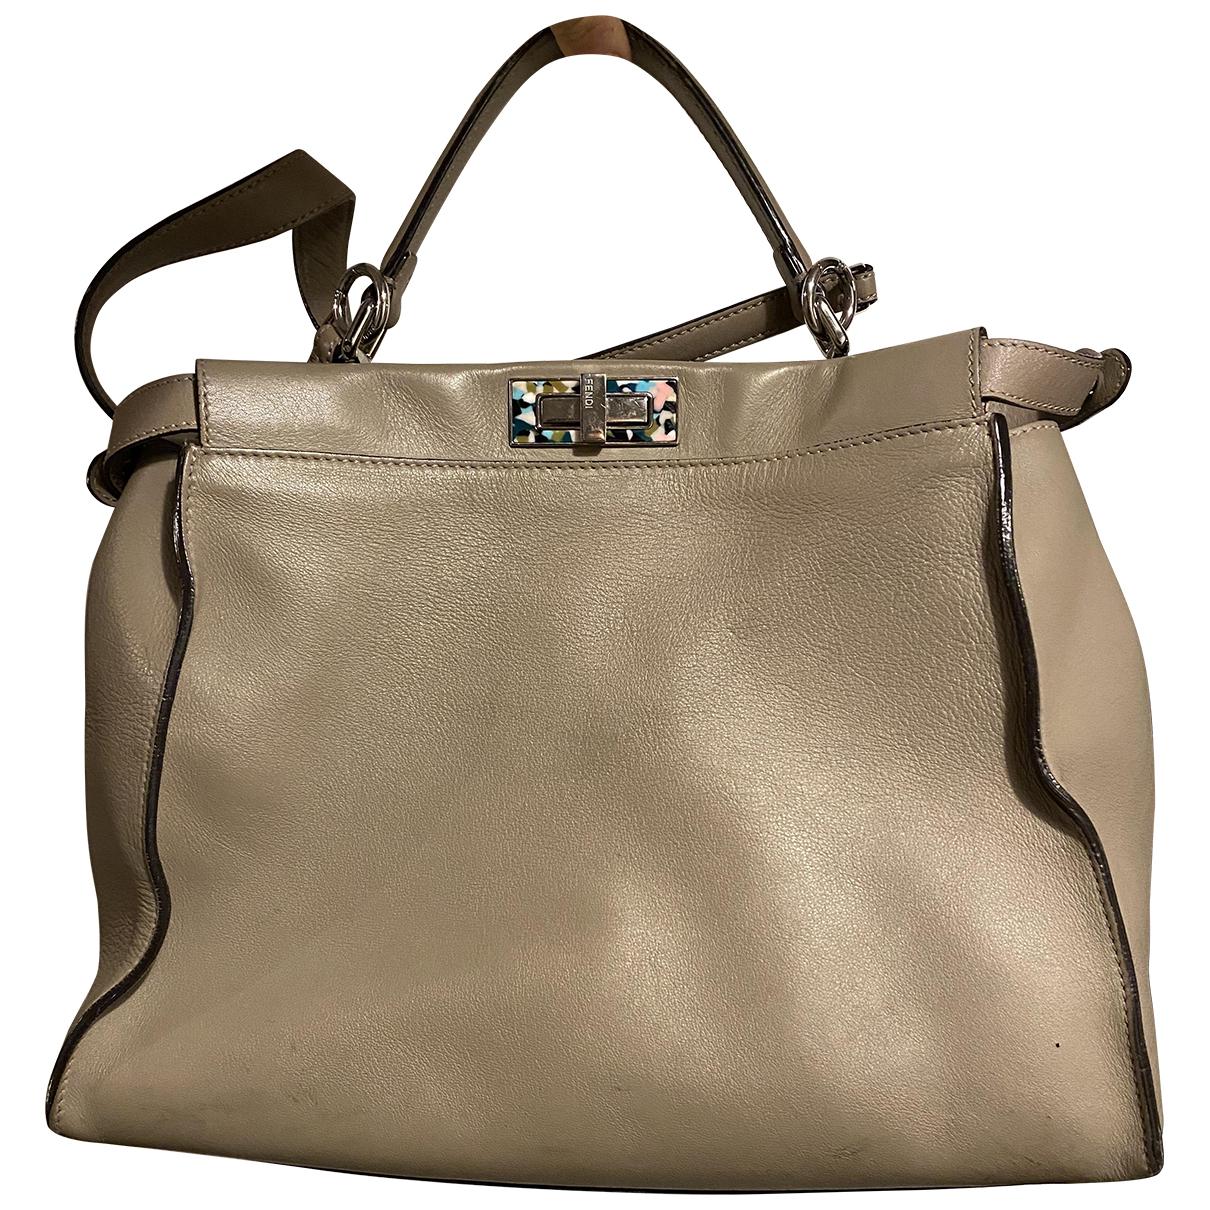 Fendi Peekaboo Beige Leather handbag for Women N